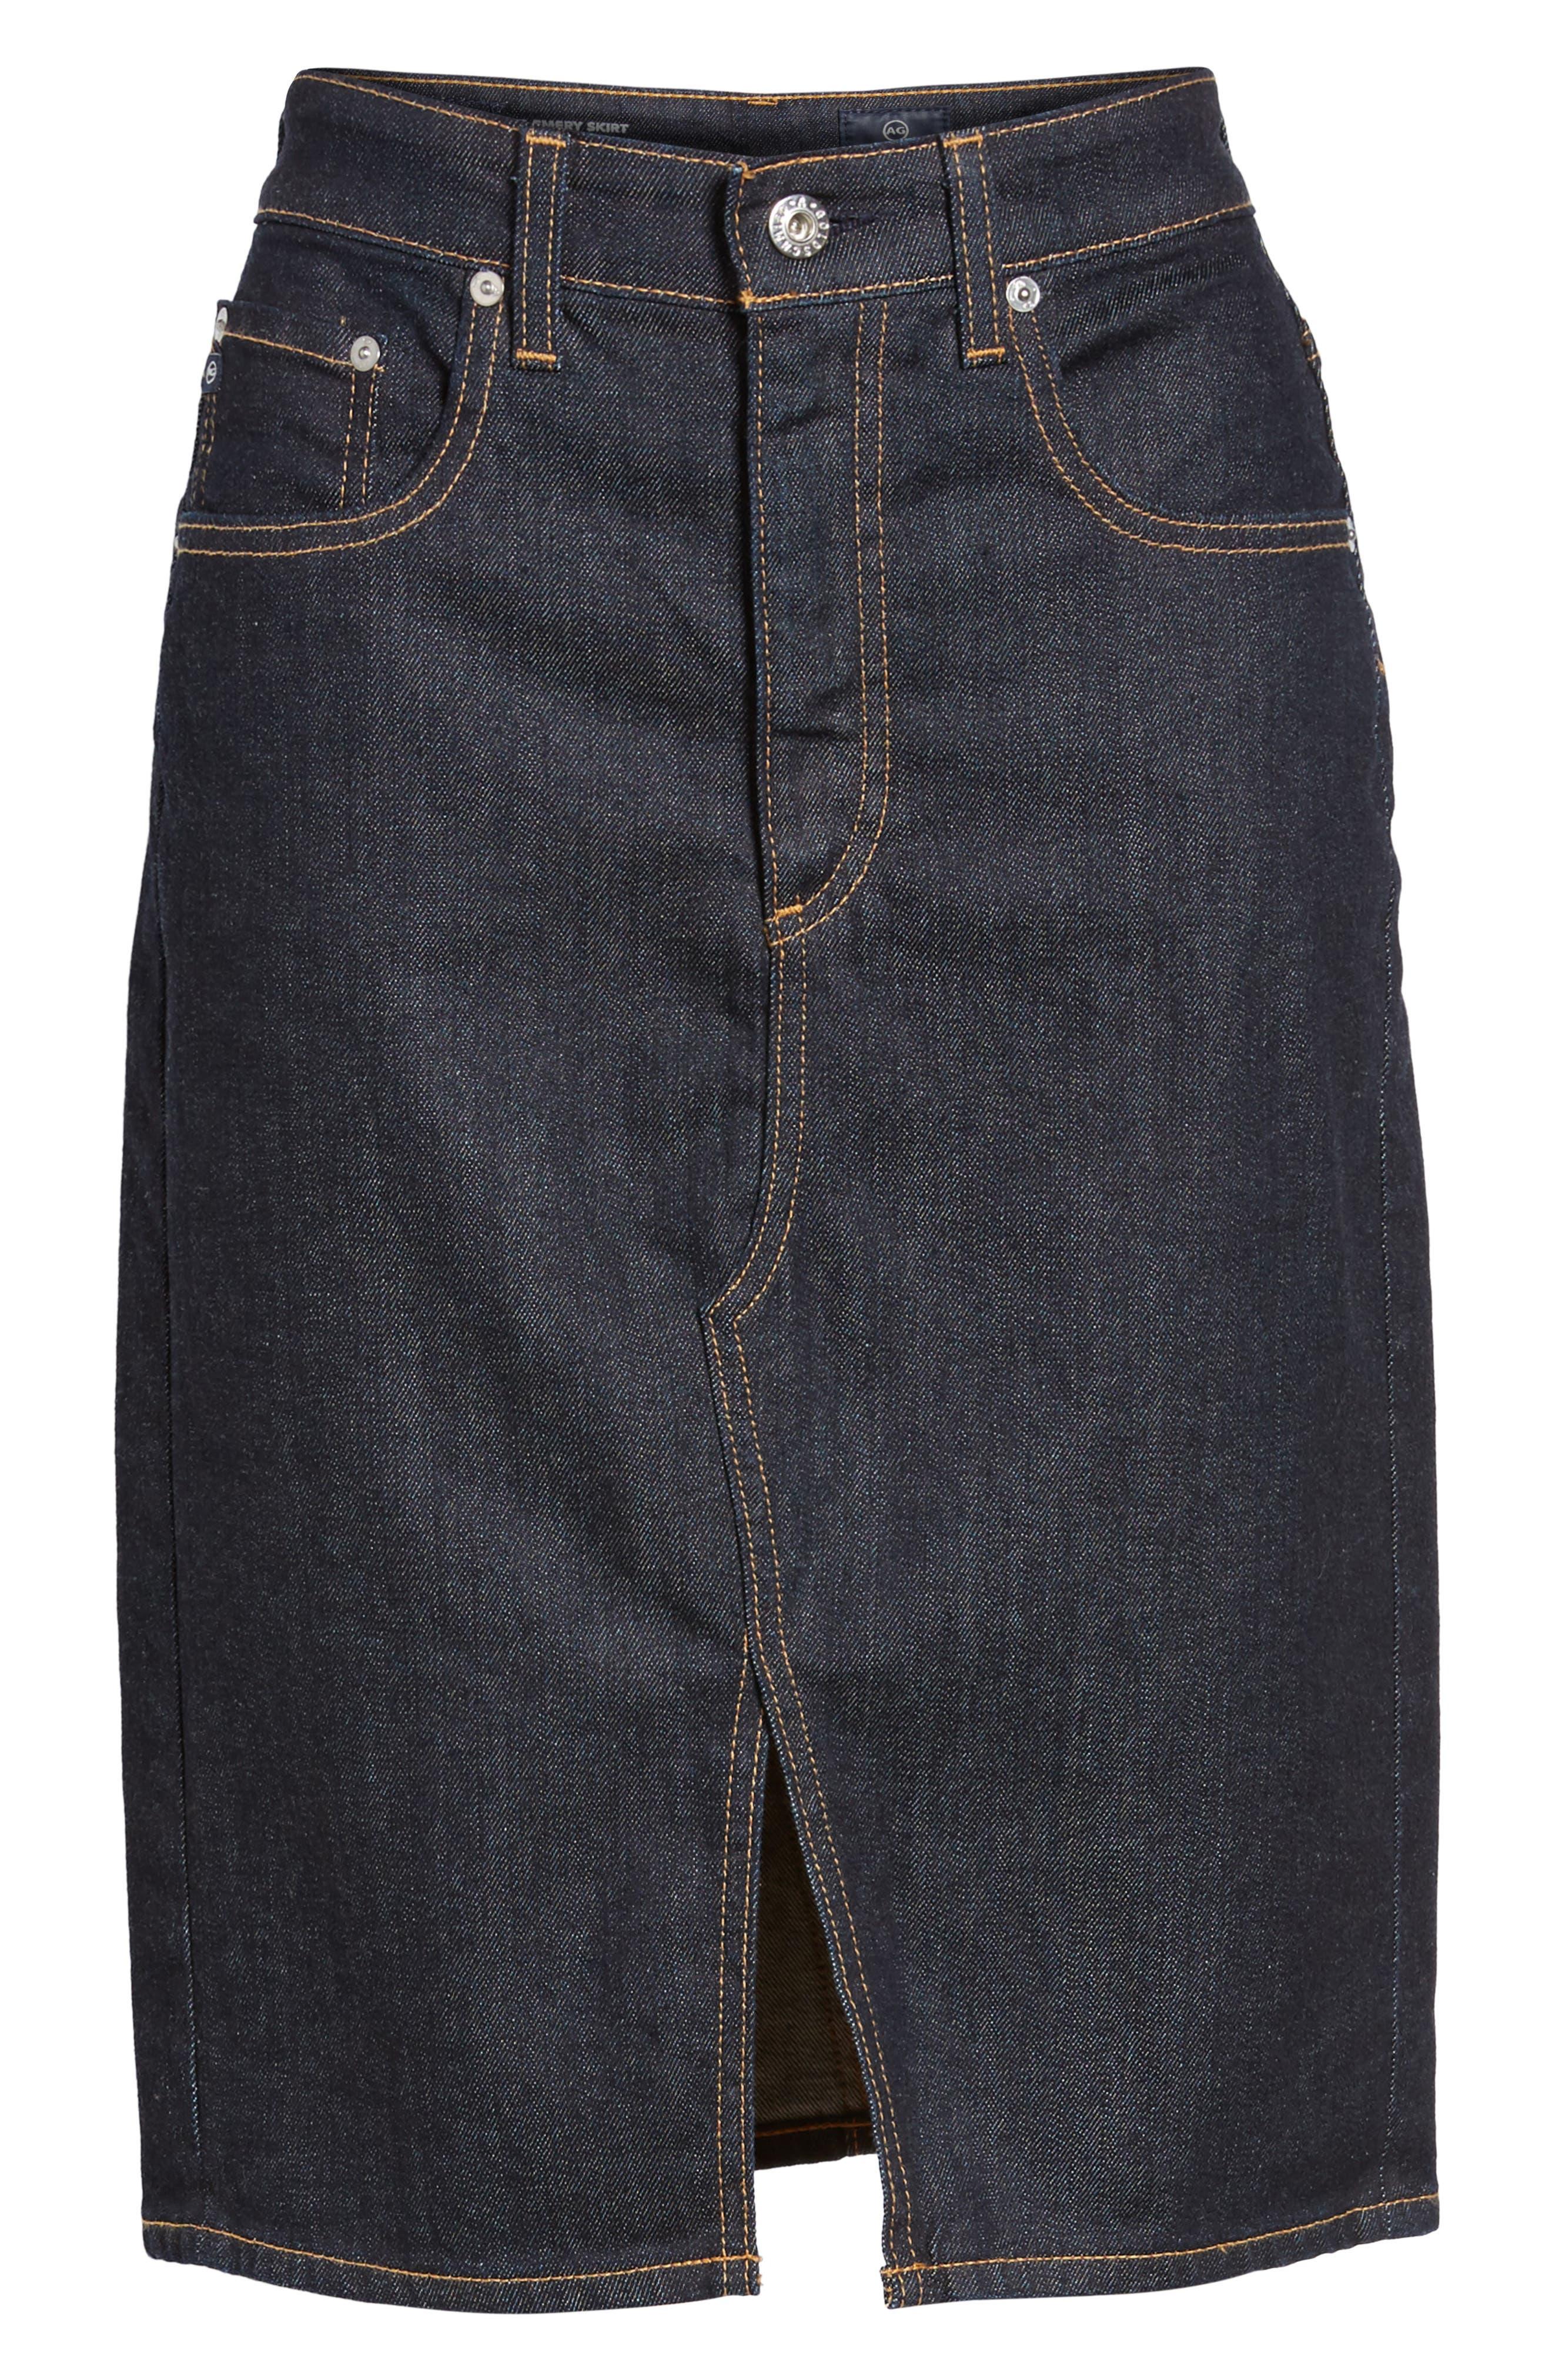 Main Image - AG Emery High Waist Denim Skirt